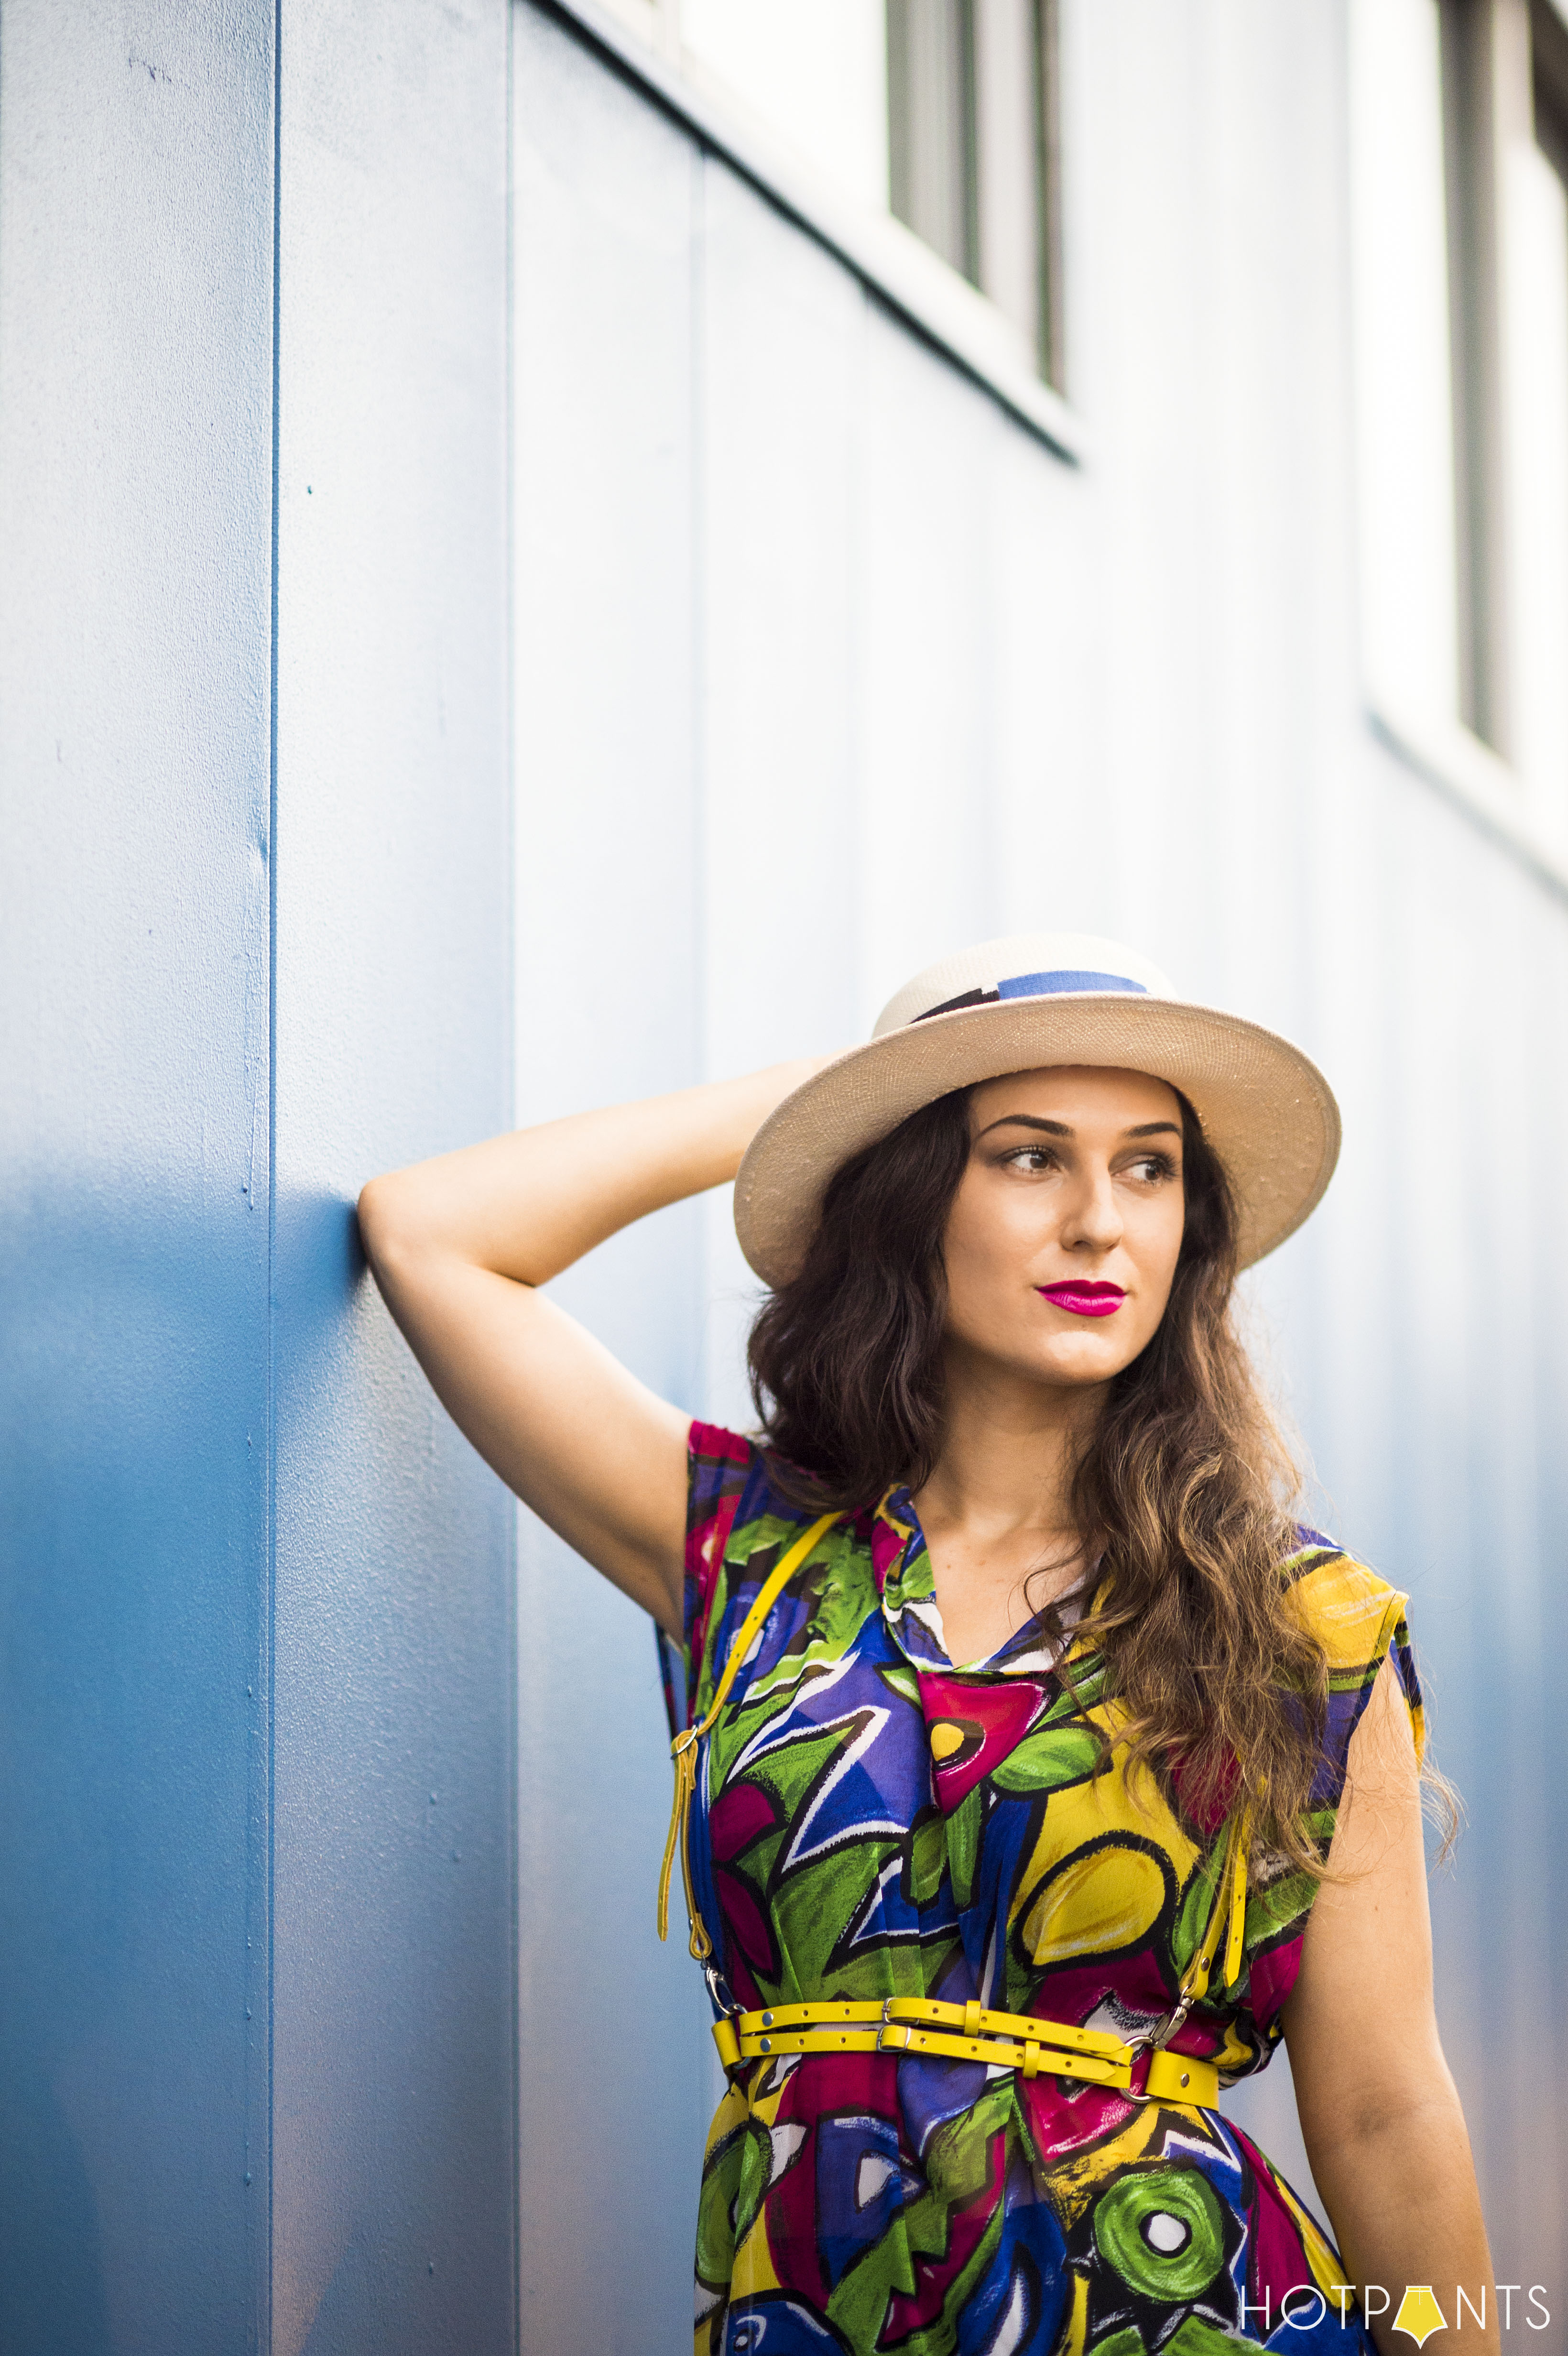 Tropical Long Sheer Skirt Bike Shorts Wide Brim Hat